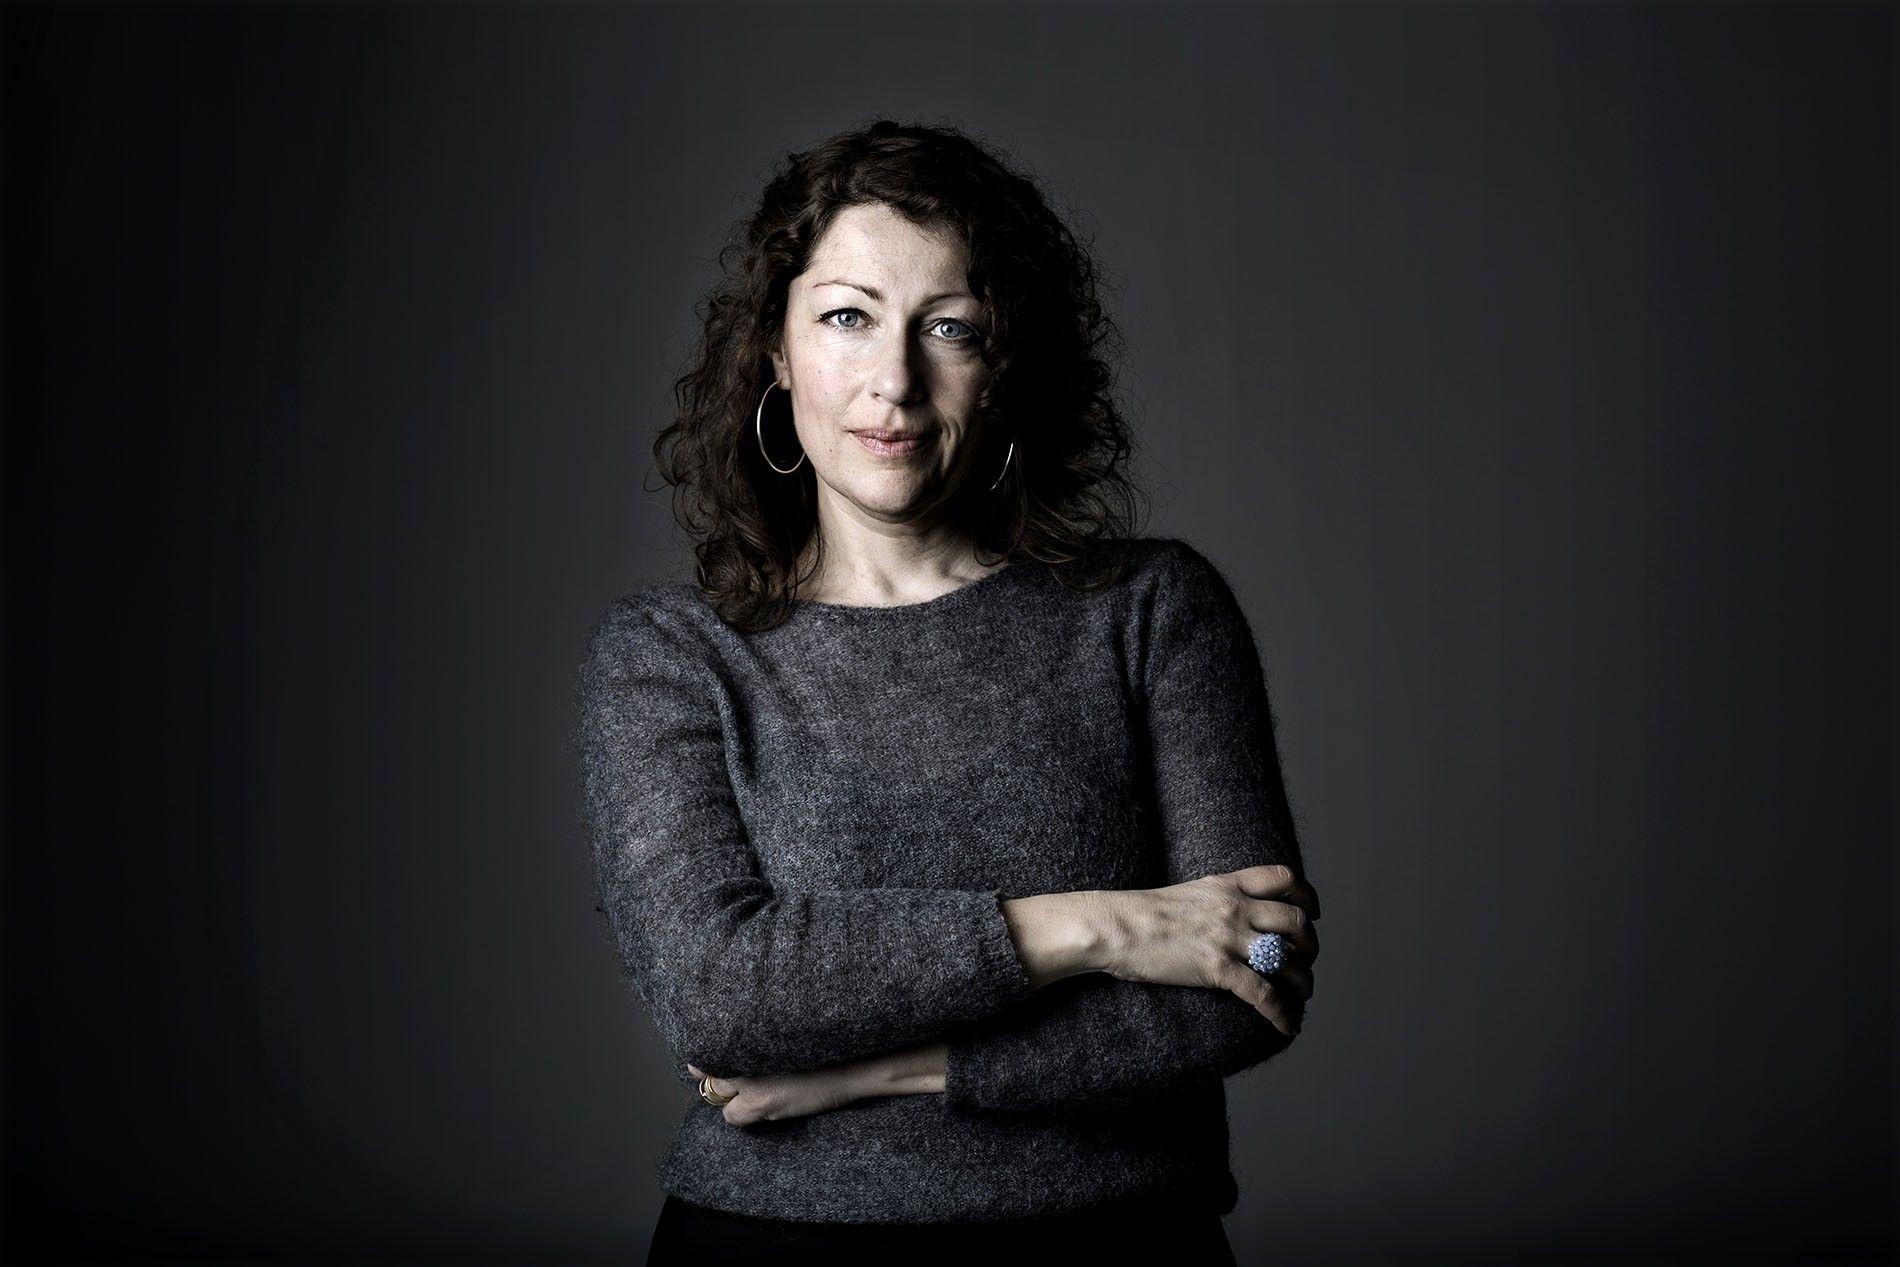 A portrait of Elisabeth Åsbrink